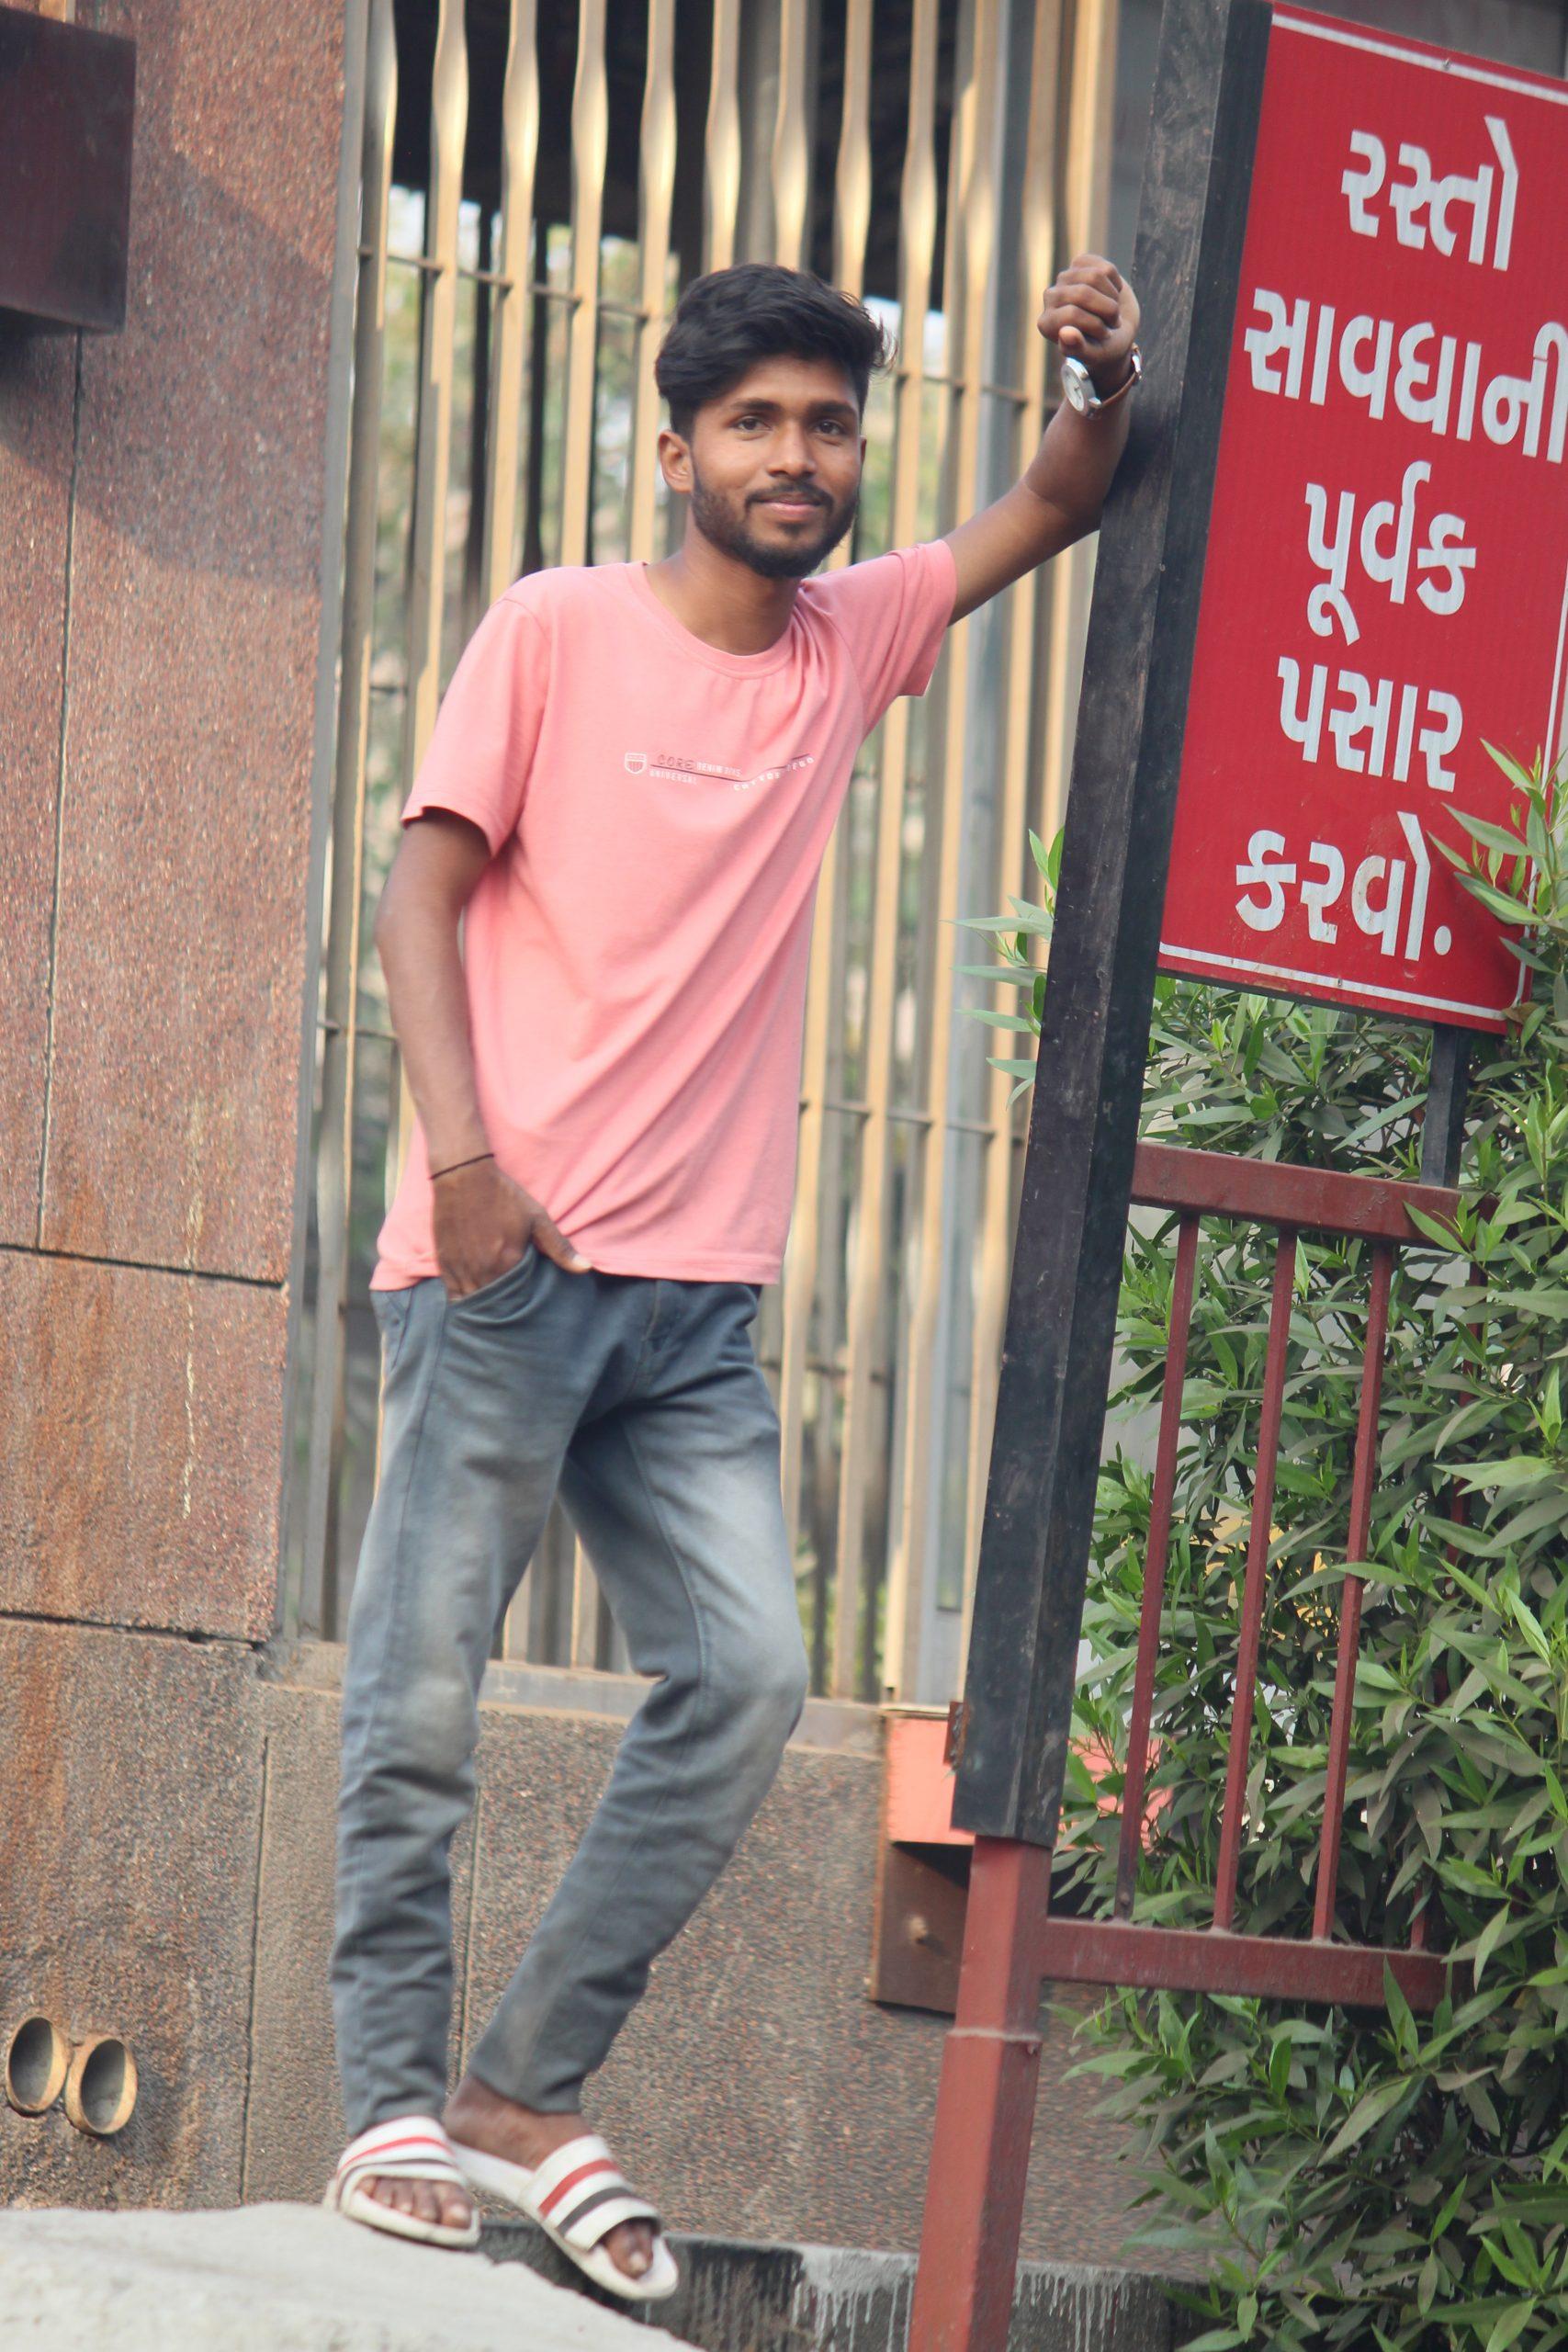 Boy posing near the caution board